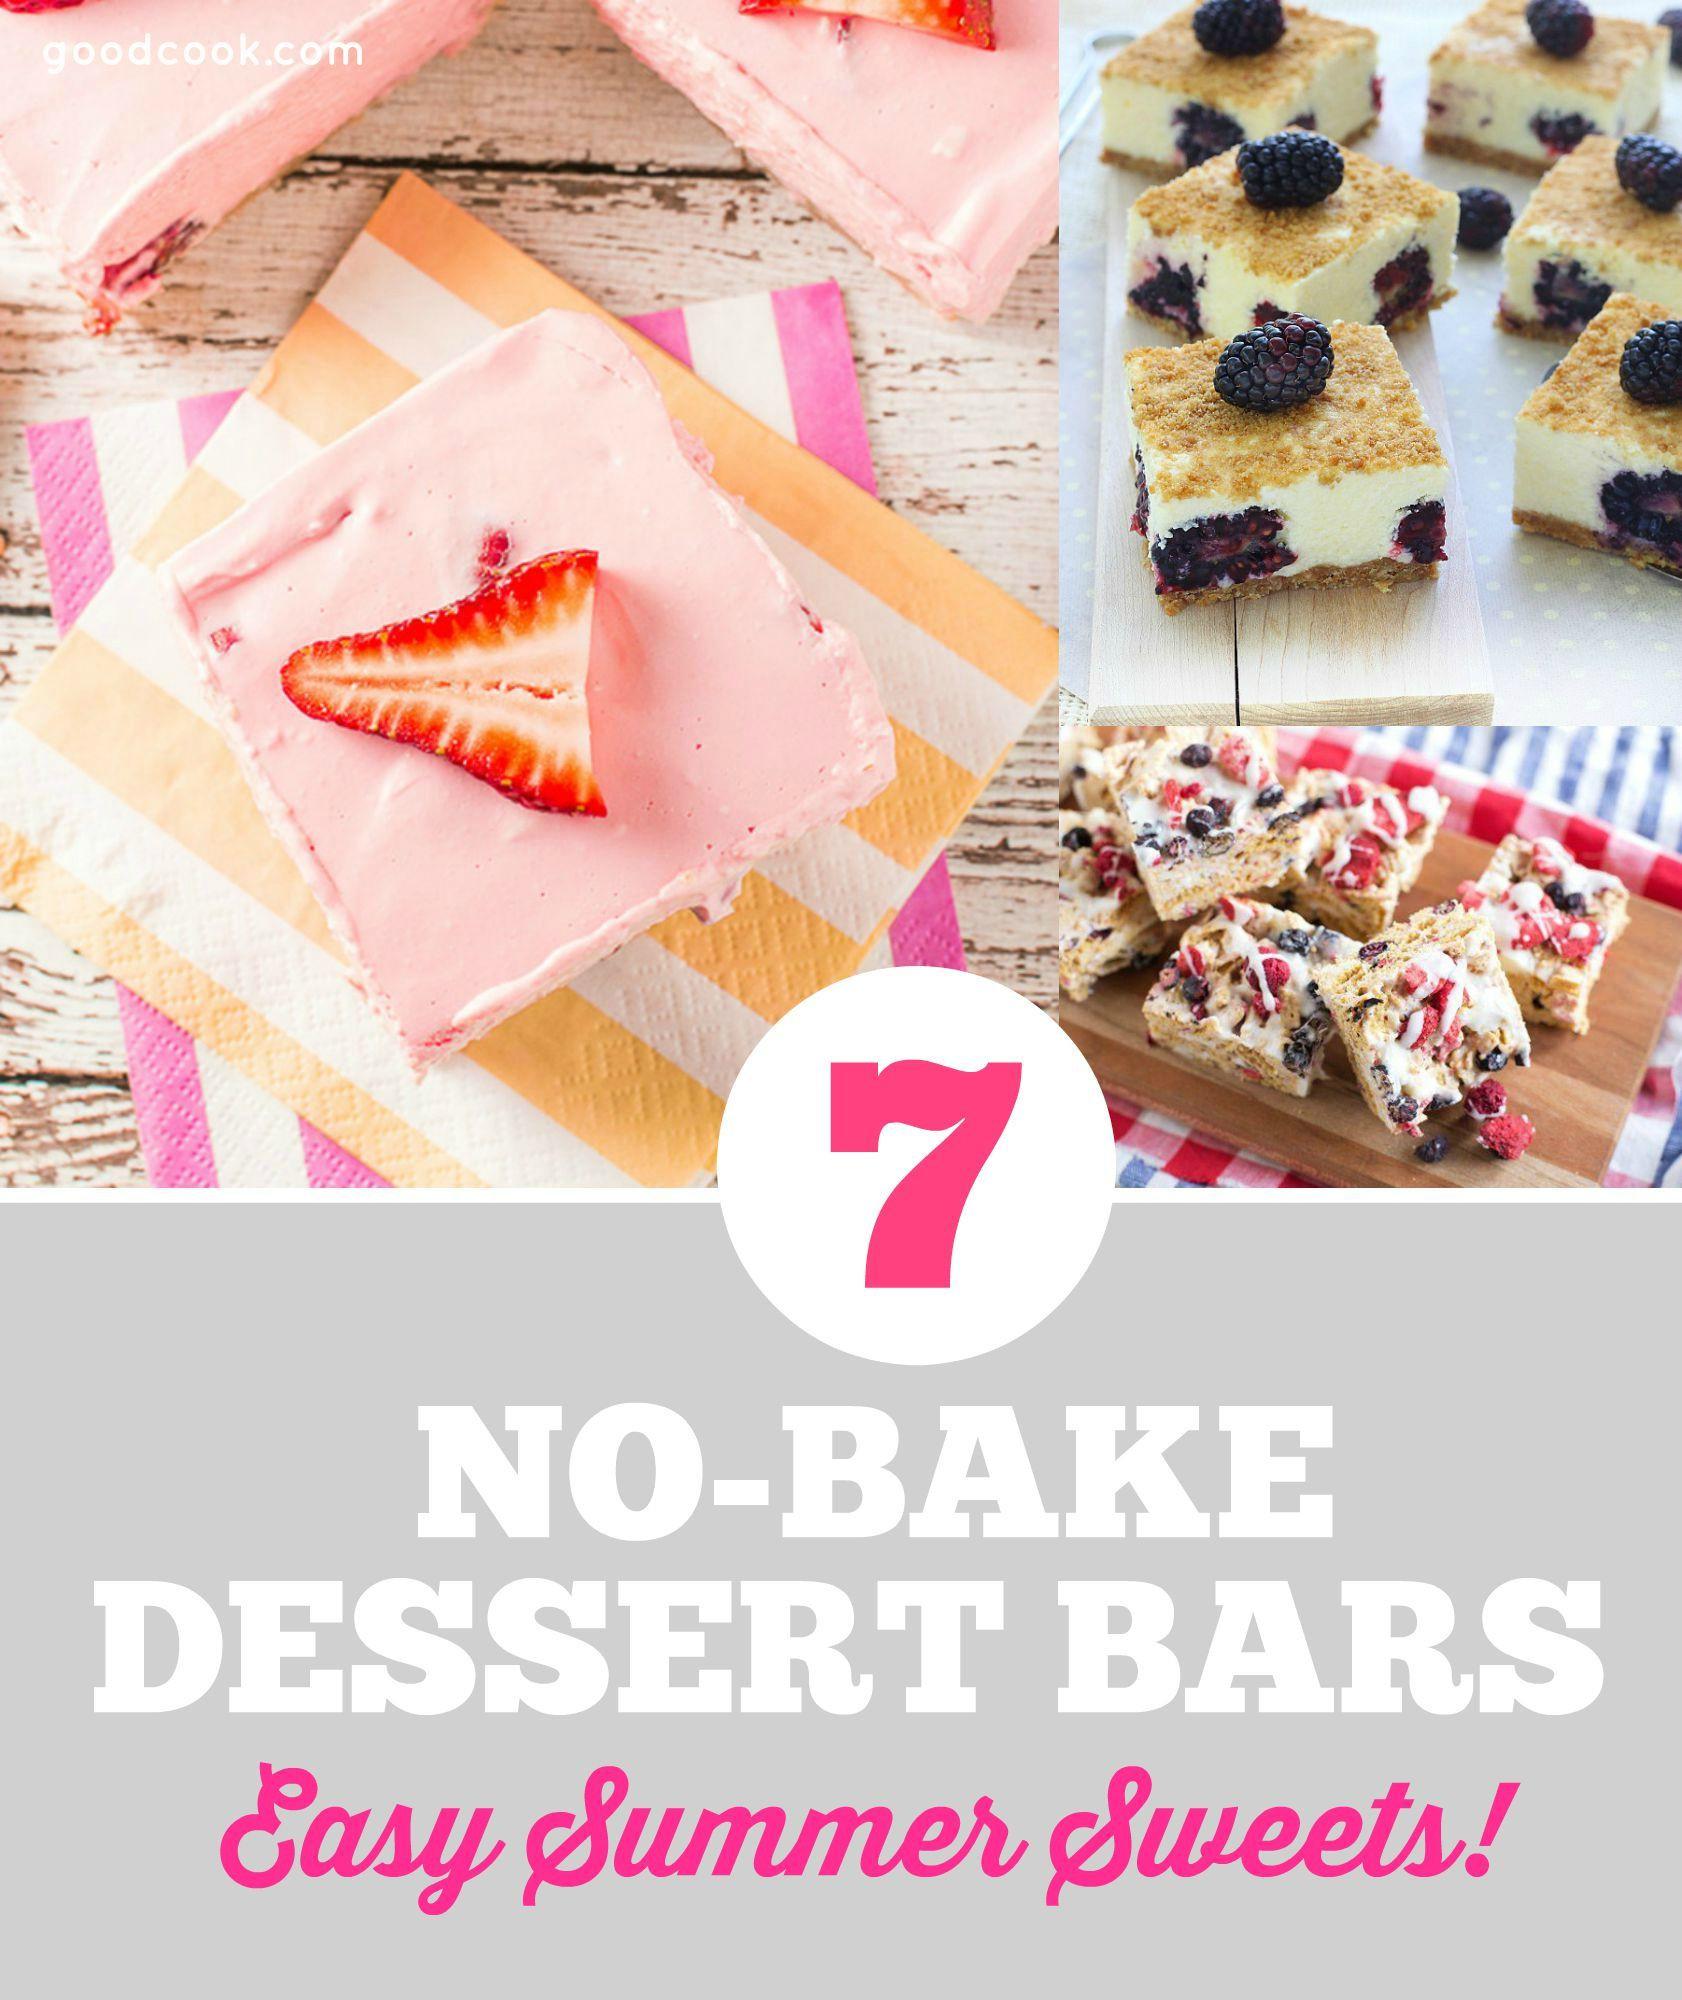 Summer No Bake Desserts  7 No Bake Summer Dessert Bars Everyday Cooking Everyday